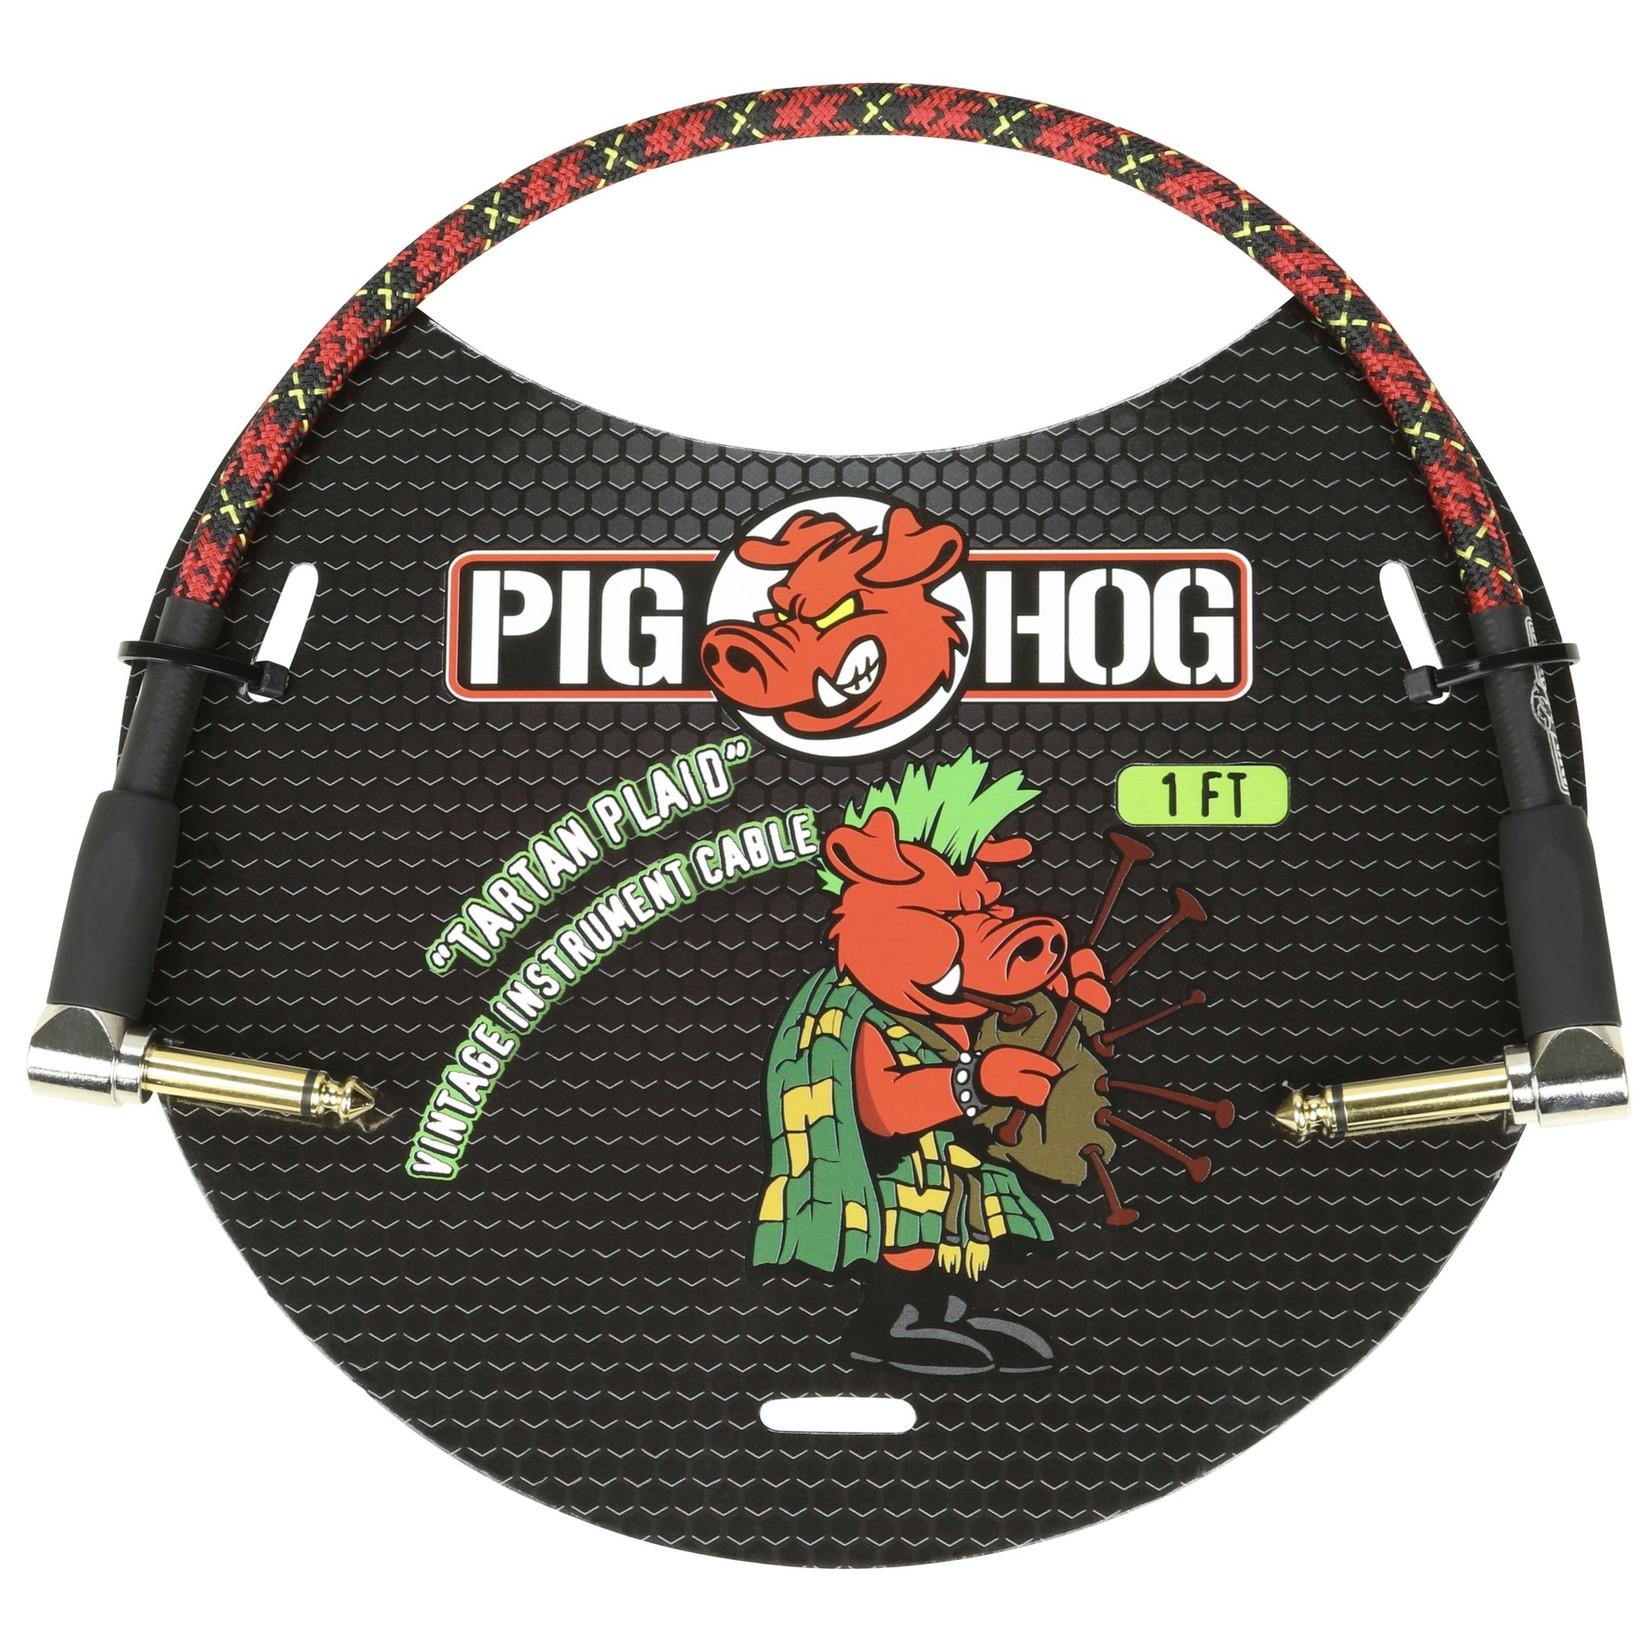 "Pig Hog Pig Hog Vintage Woven Patch Cable, 1-Foot, 7mm, Right-Angle Connectors, ""Tartan Plaid"" (PCH1PLR)"